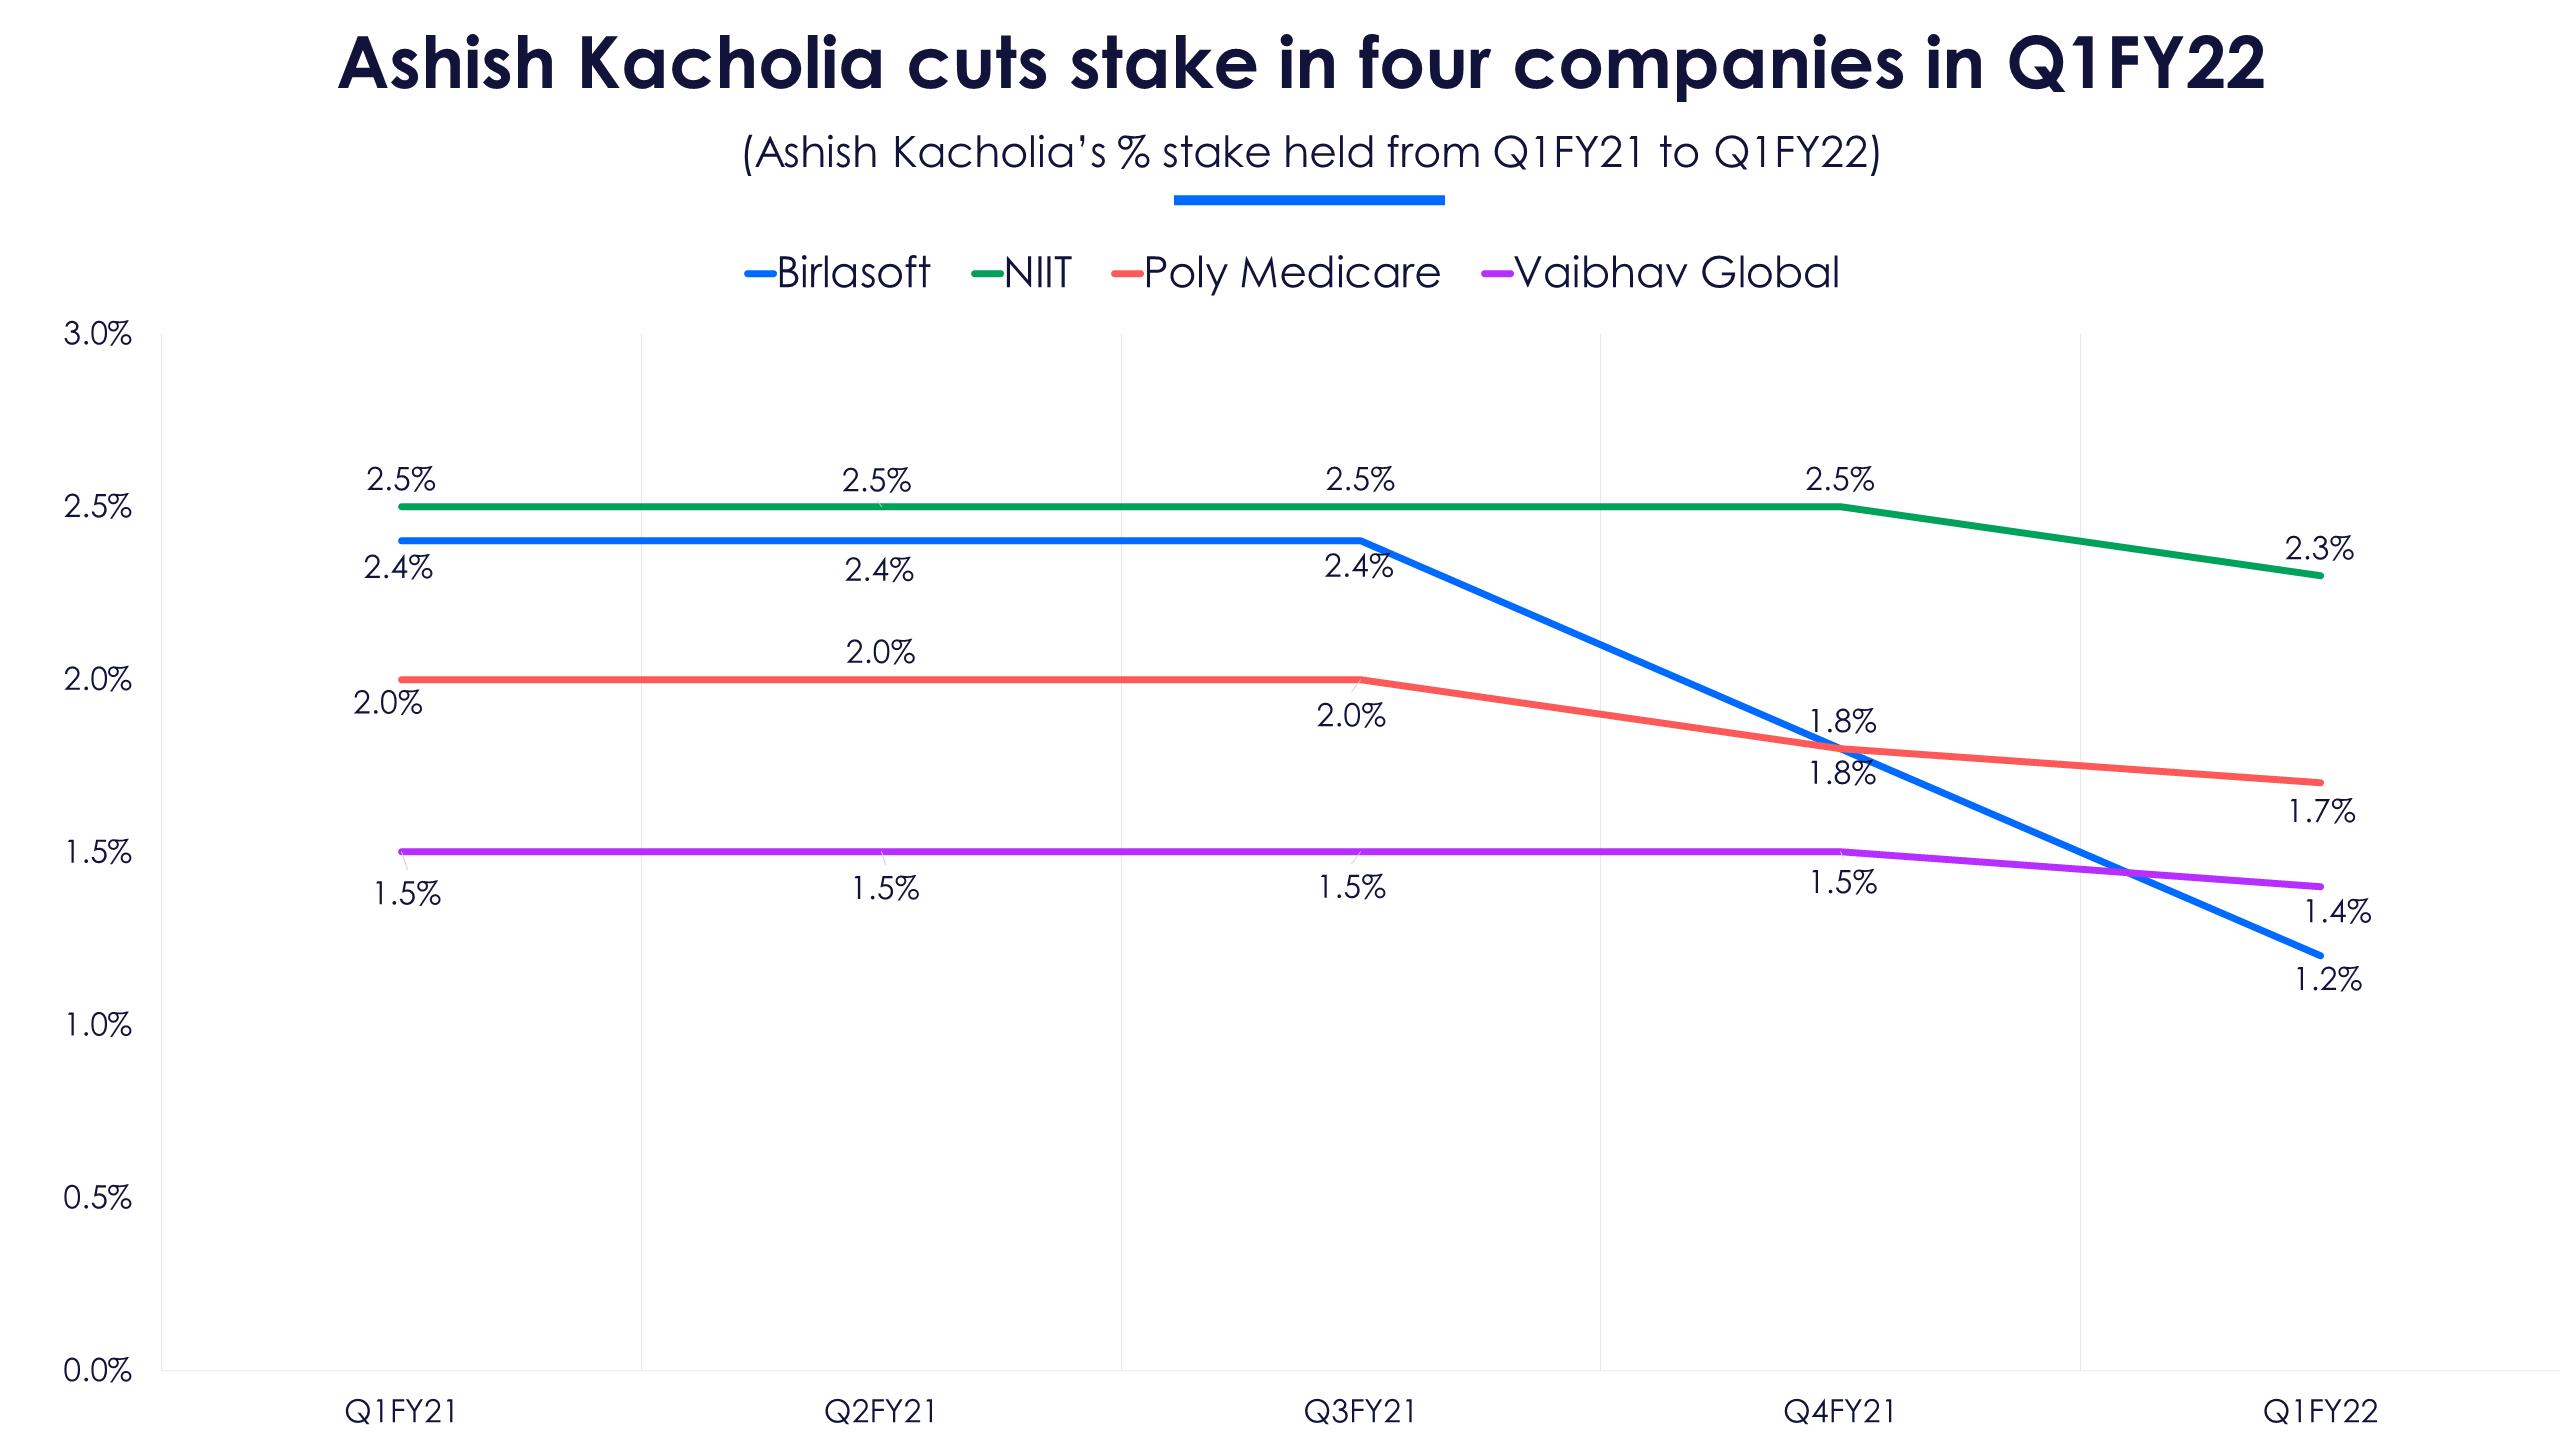 Ashish Kacholia sells